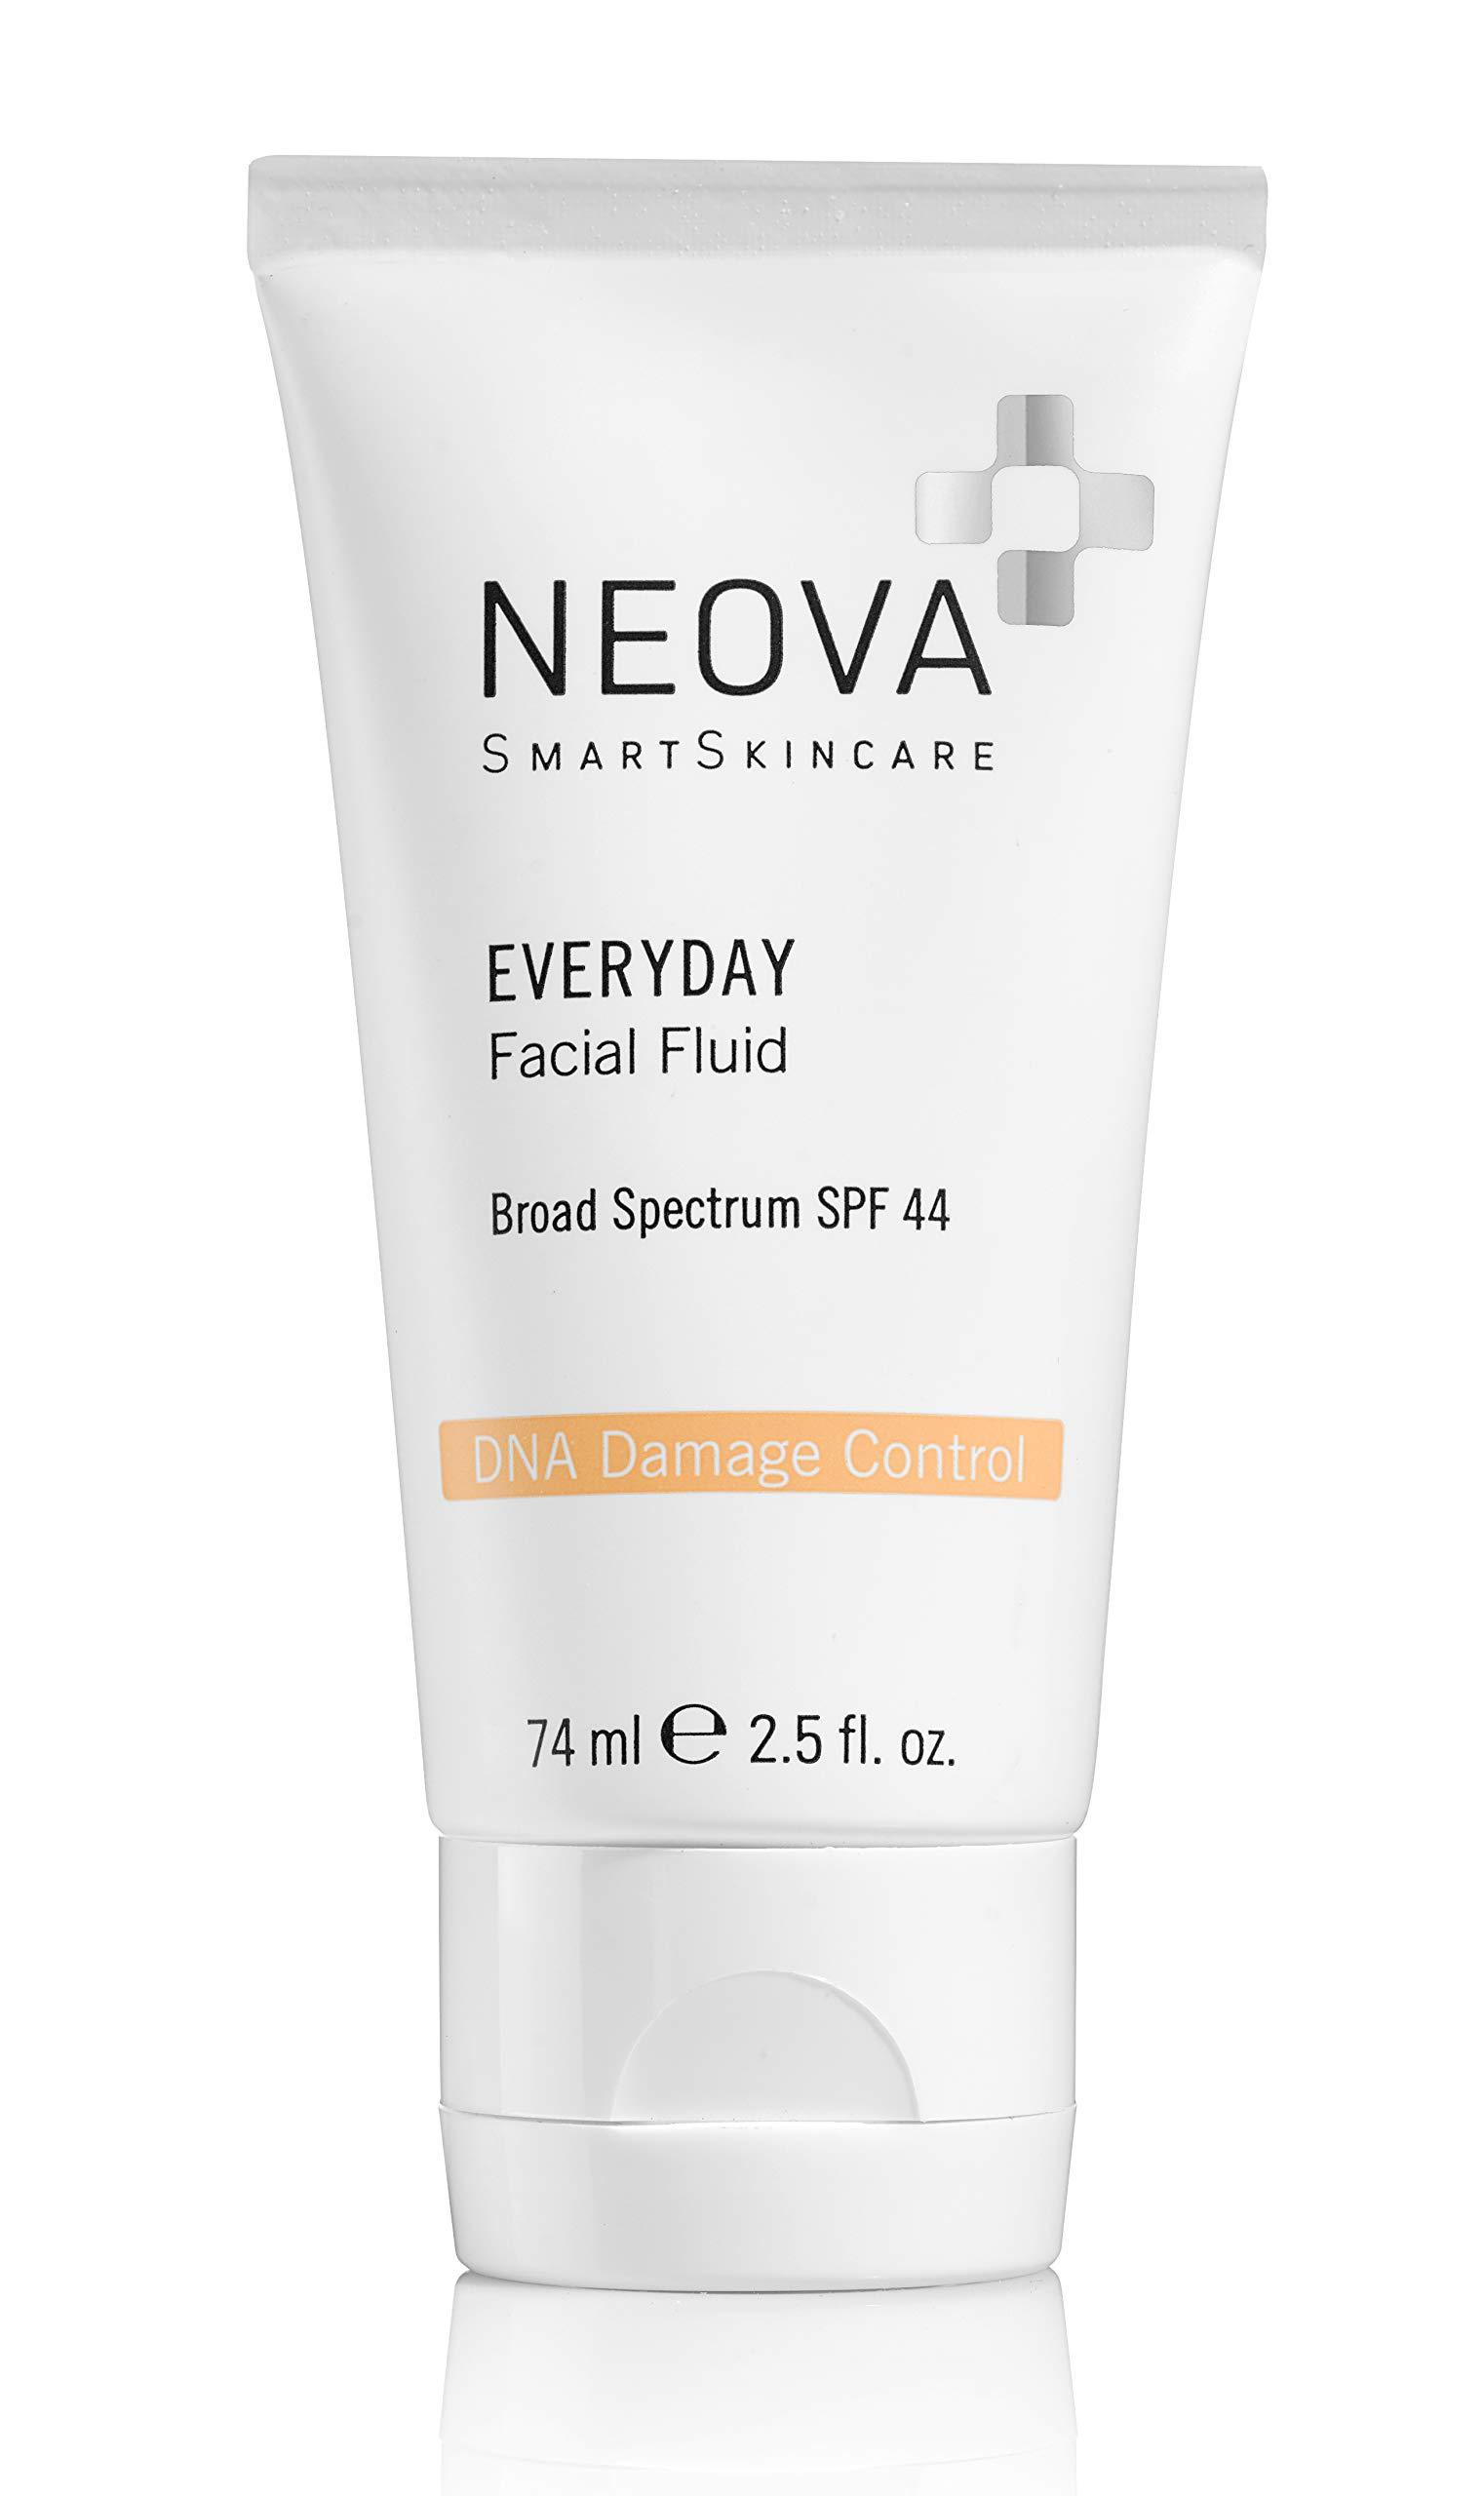 NEOVA DNA Damage Control Everyday SPF 44, 2.5 Fl Oz